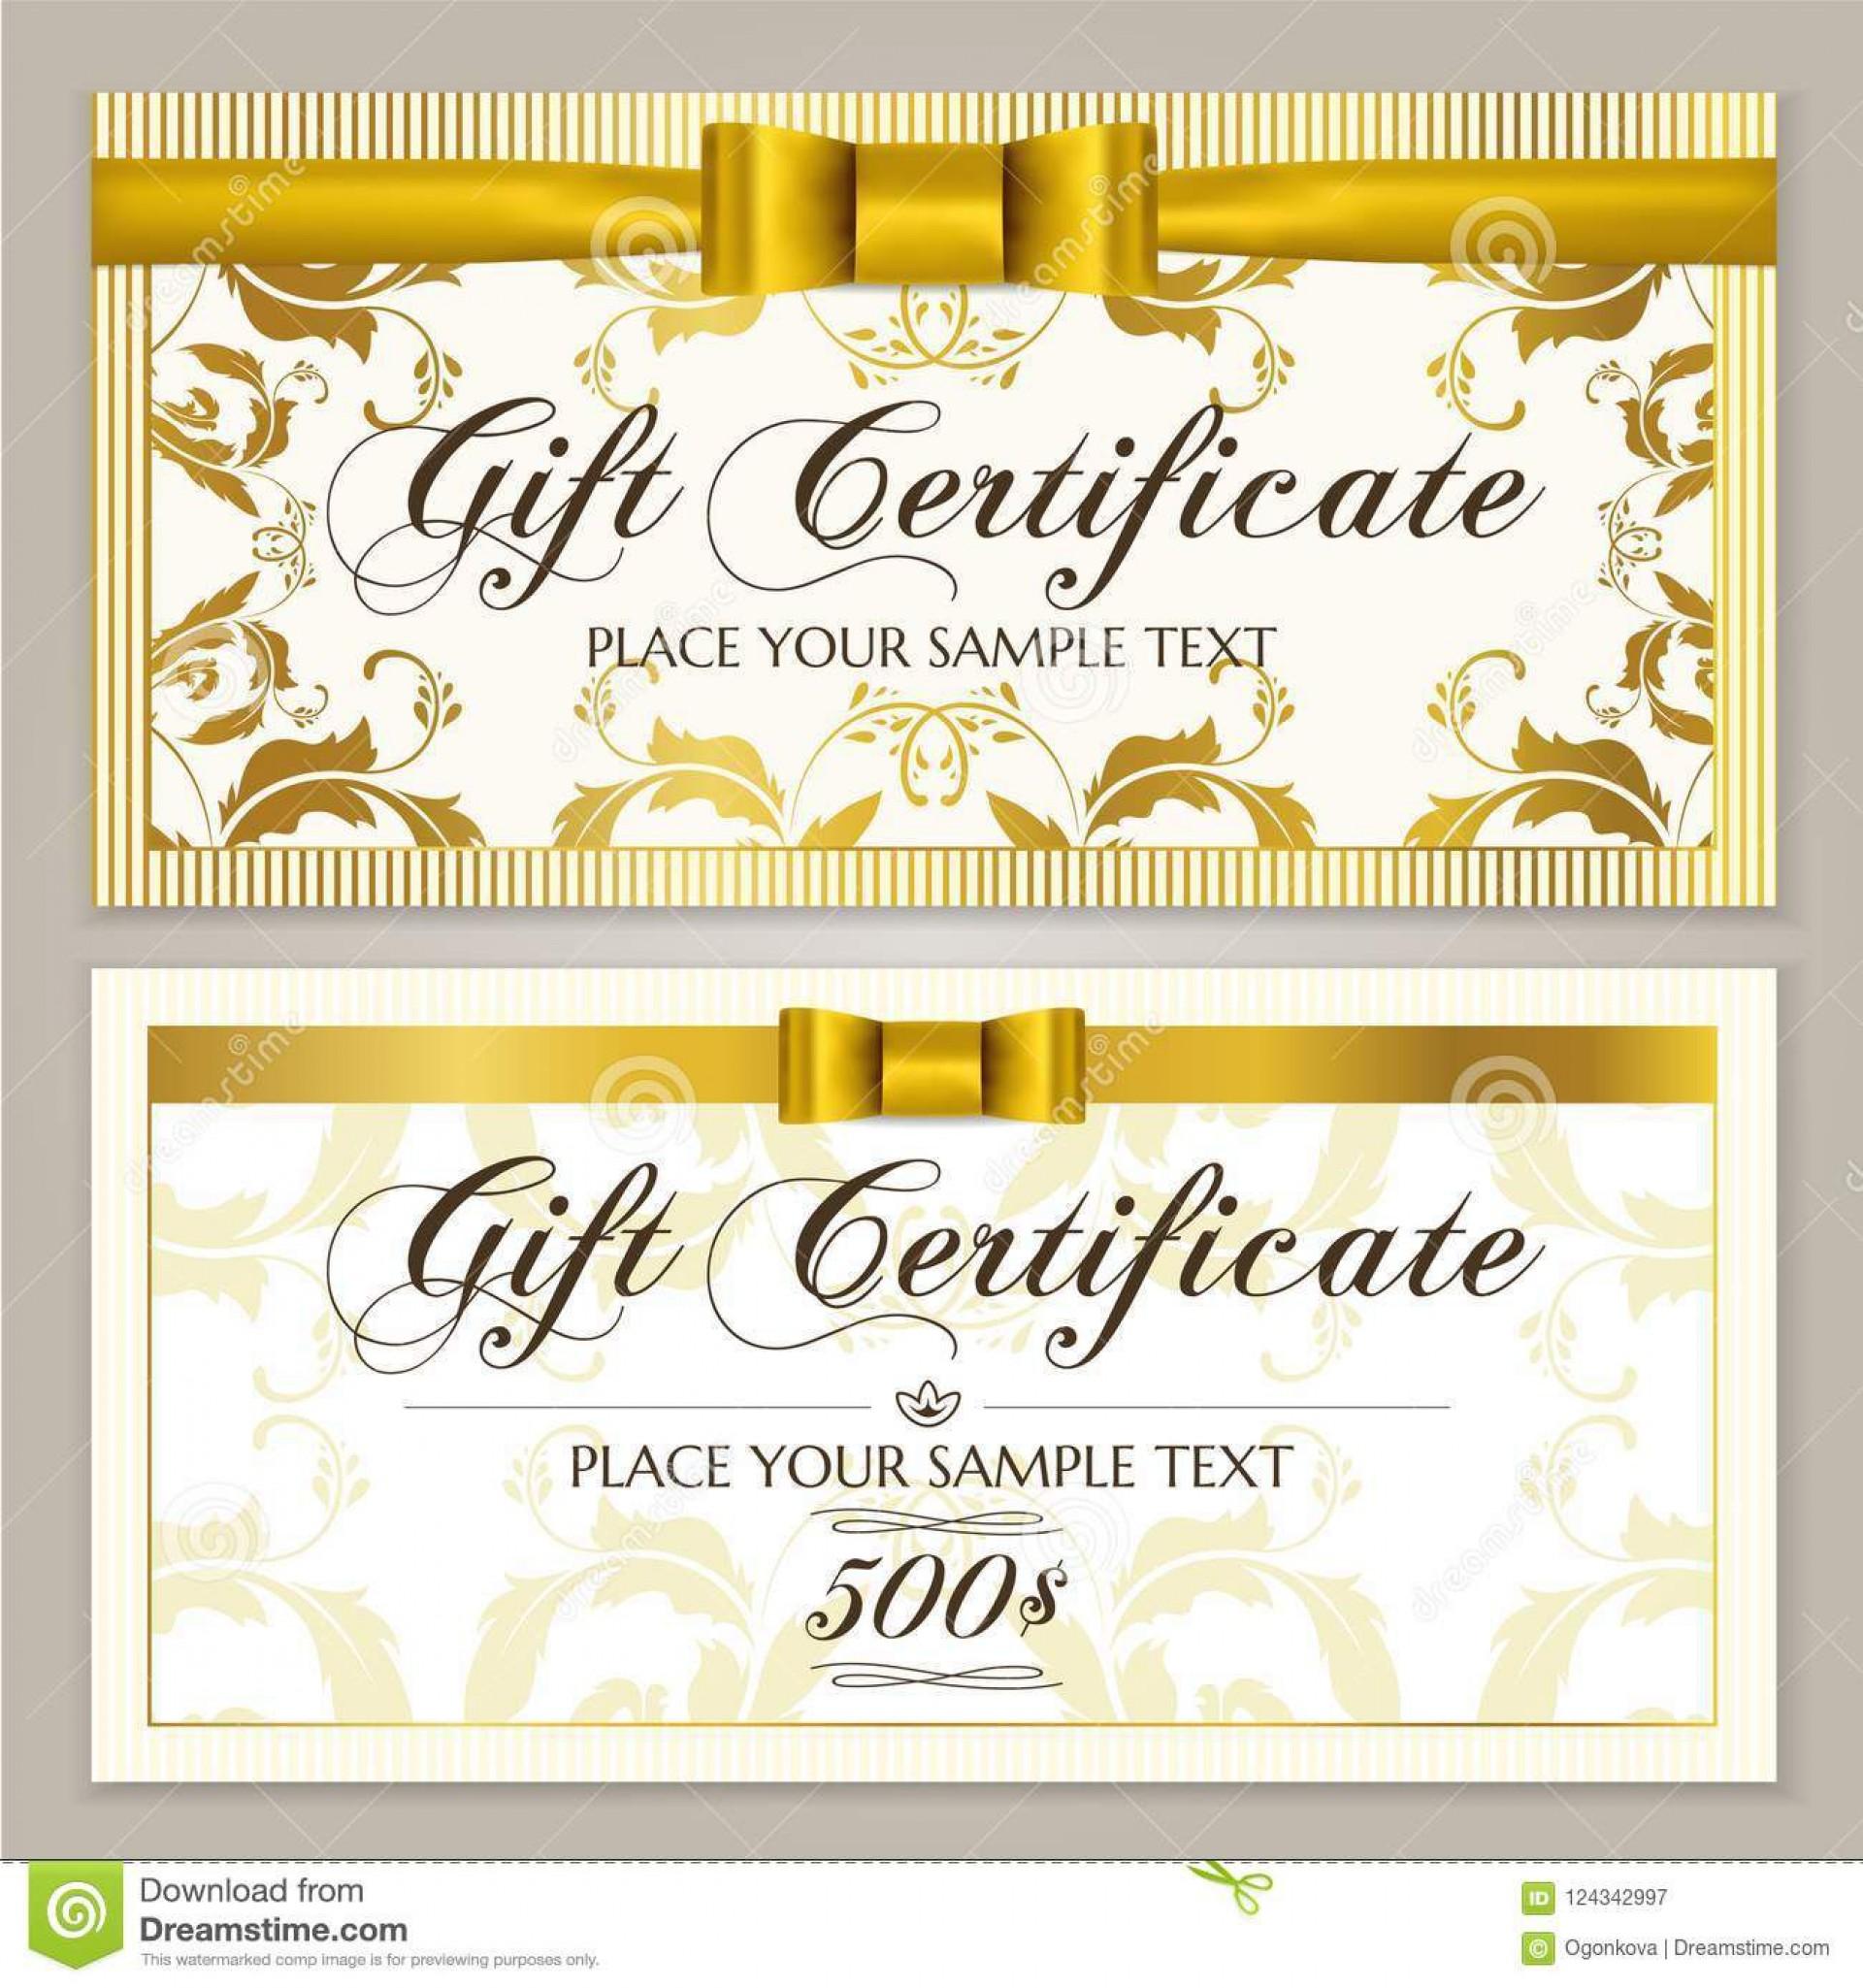 010 Surprising Restaurant Gift Certificate Template High Resolution  Templates Card Word Voucher Free1920